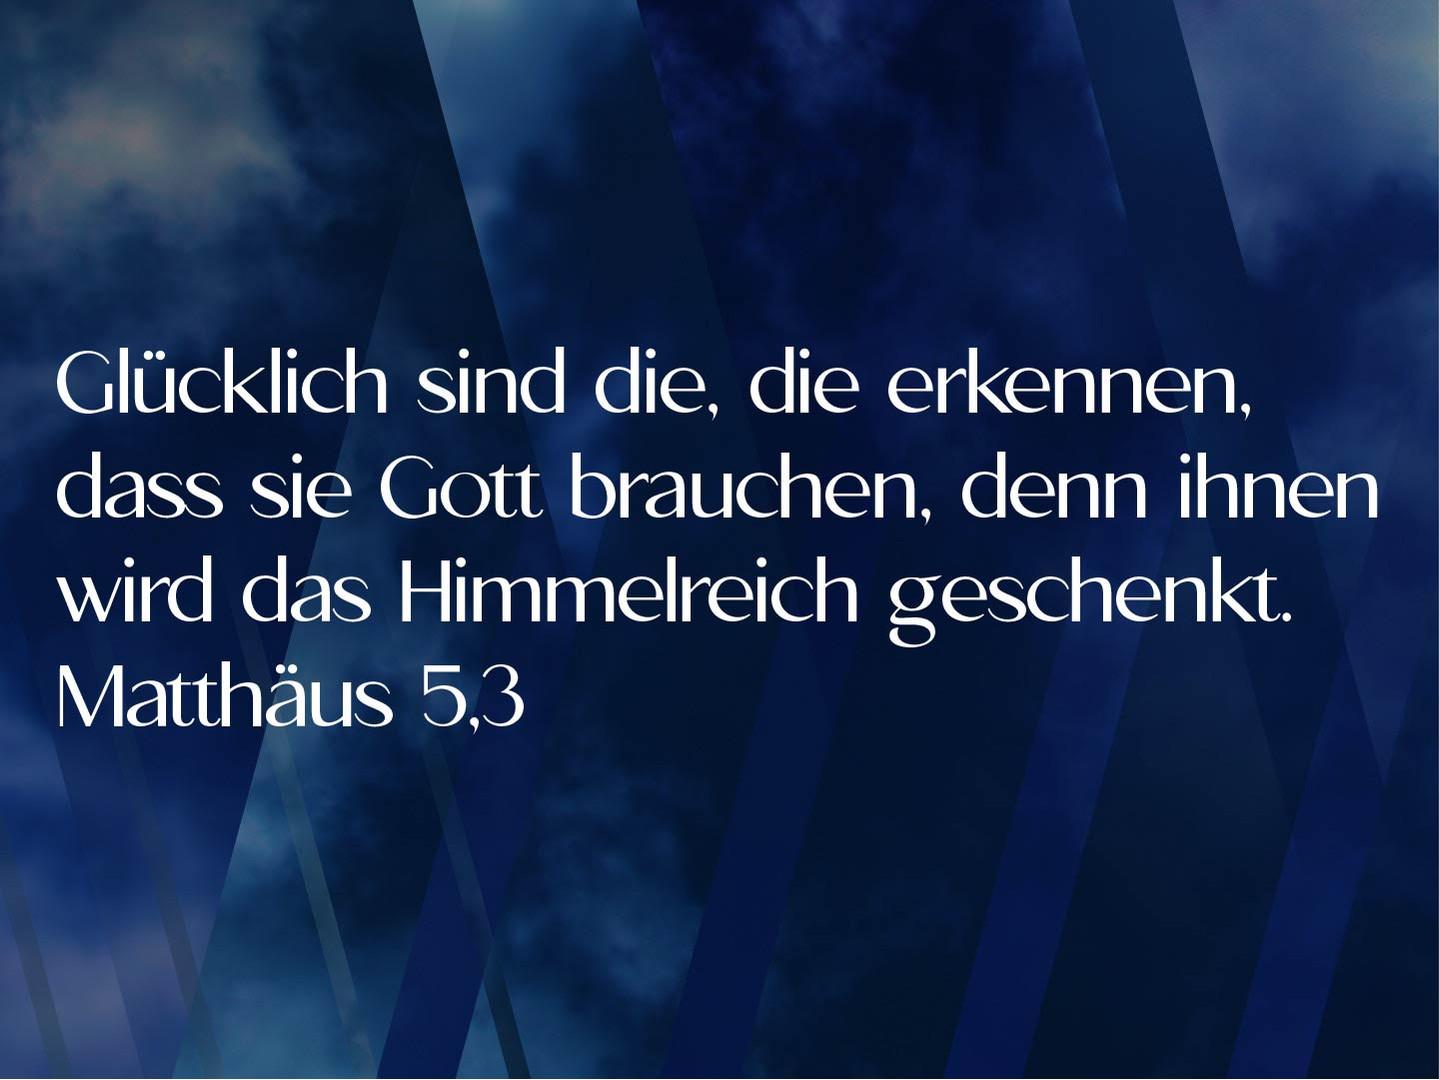 Matthäus 5,3.jpg